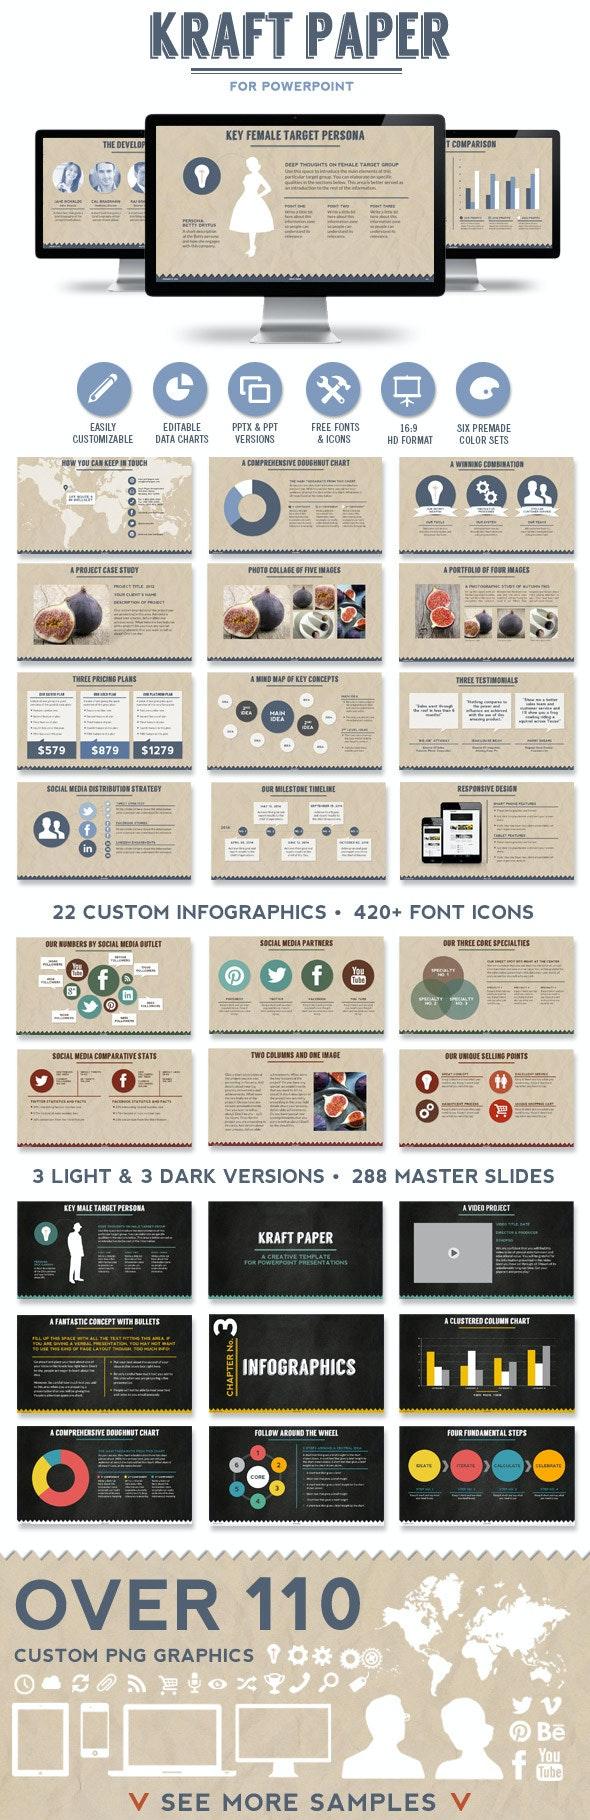 Kraft Paper Powerpoint Presentation Template - Creative PowerPoint Templates